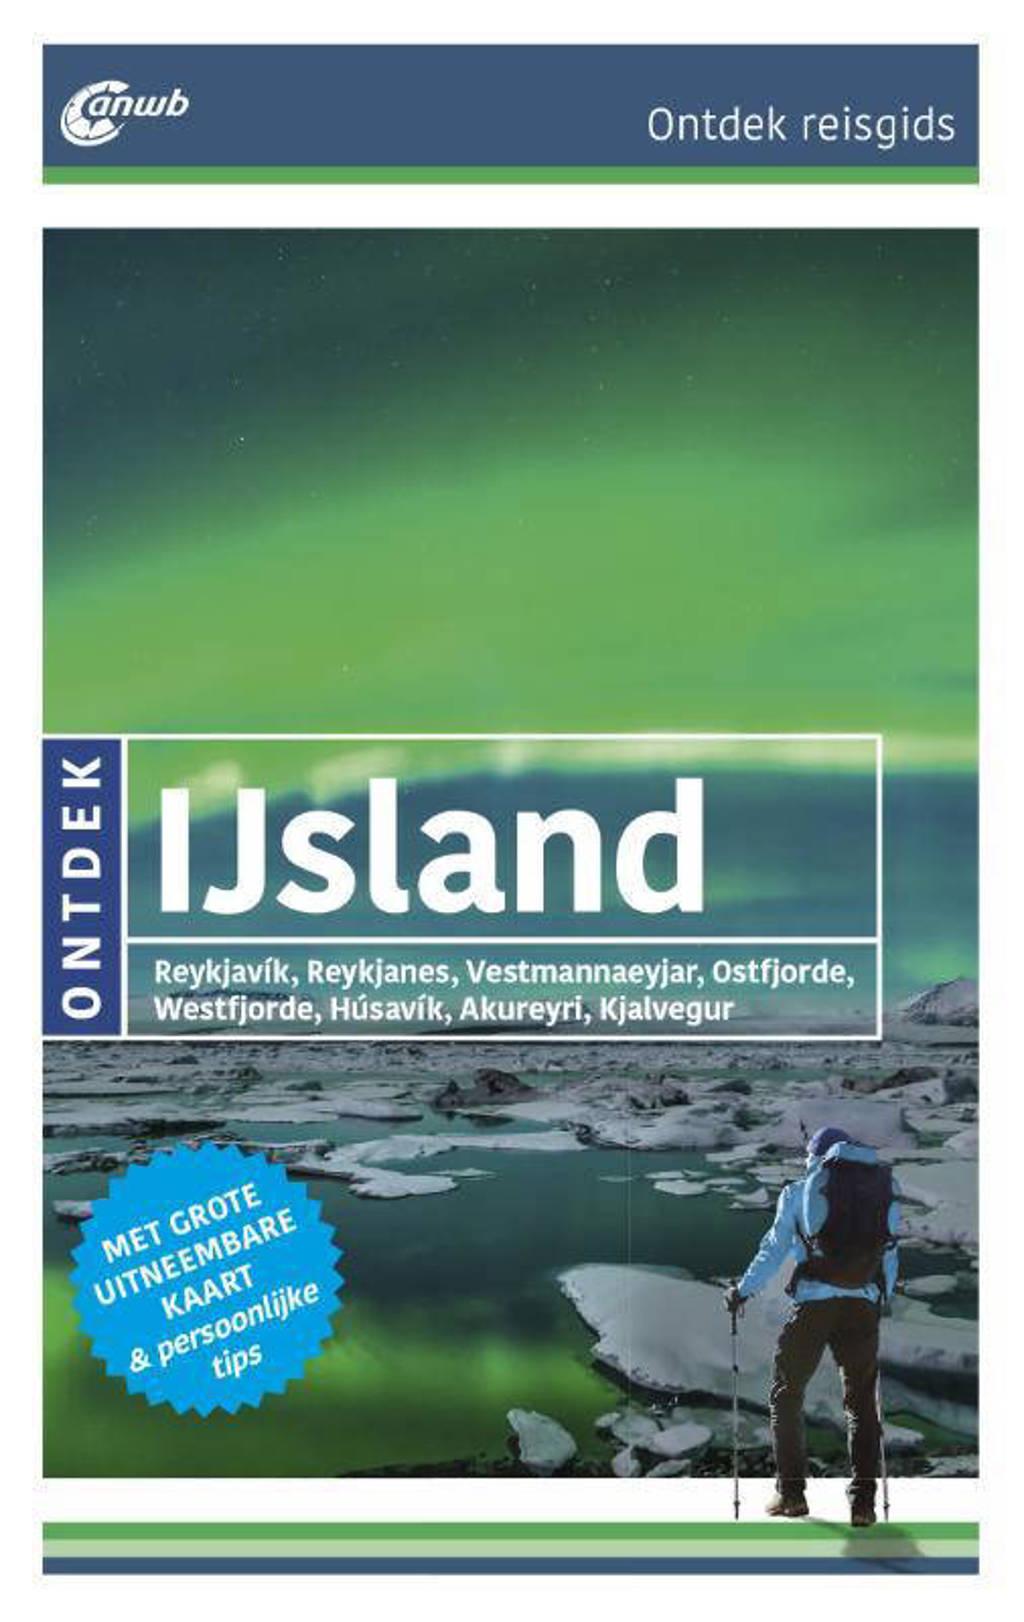 b27f52c8525 Sabine Barth ANWB Ontdek reisgids: IJsland | wehkamp